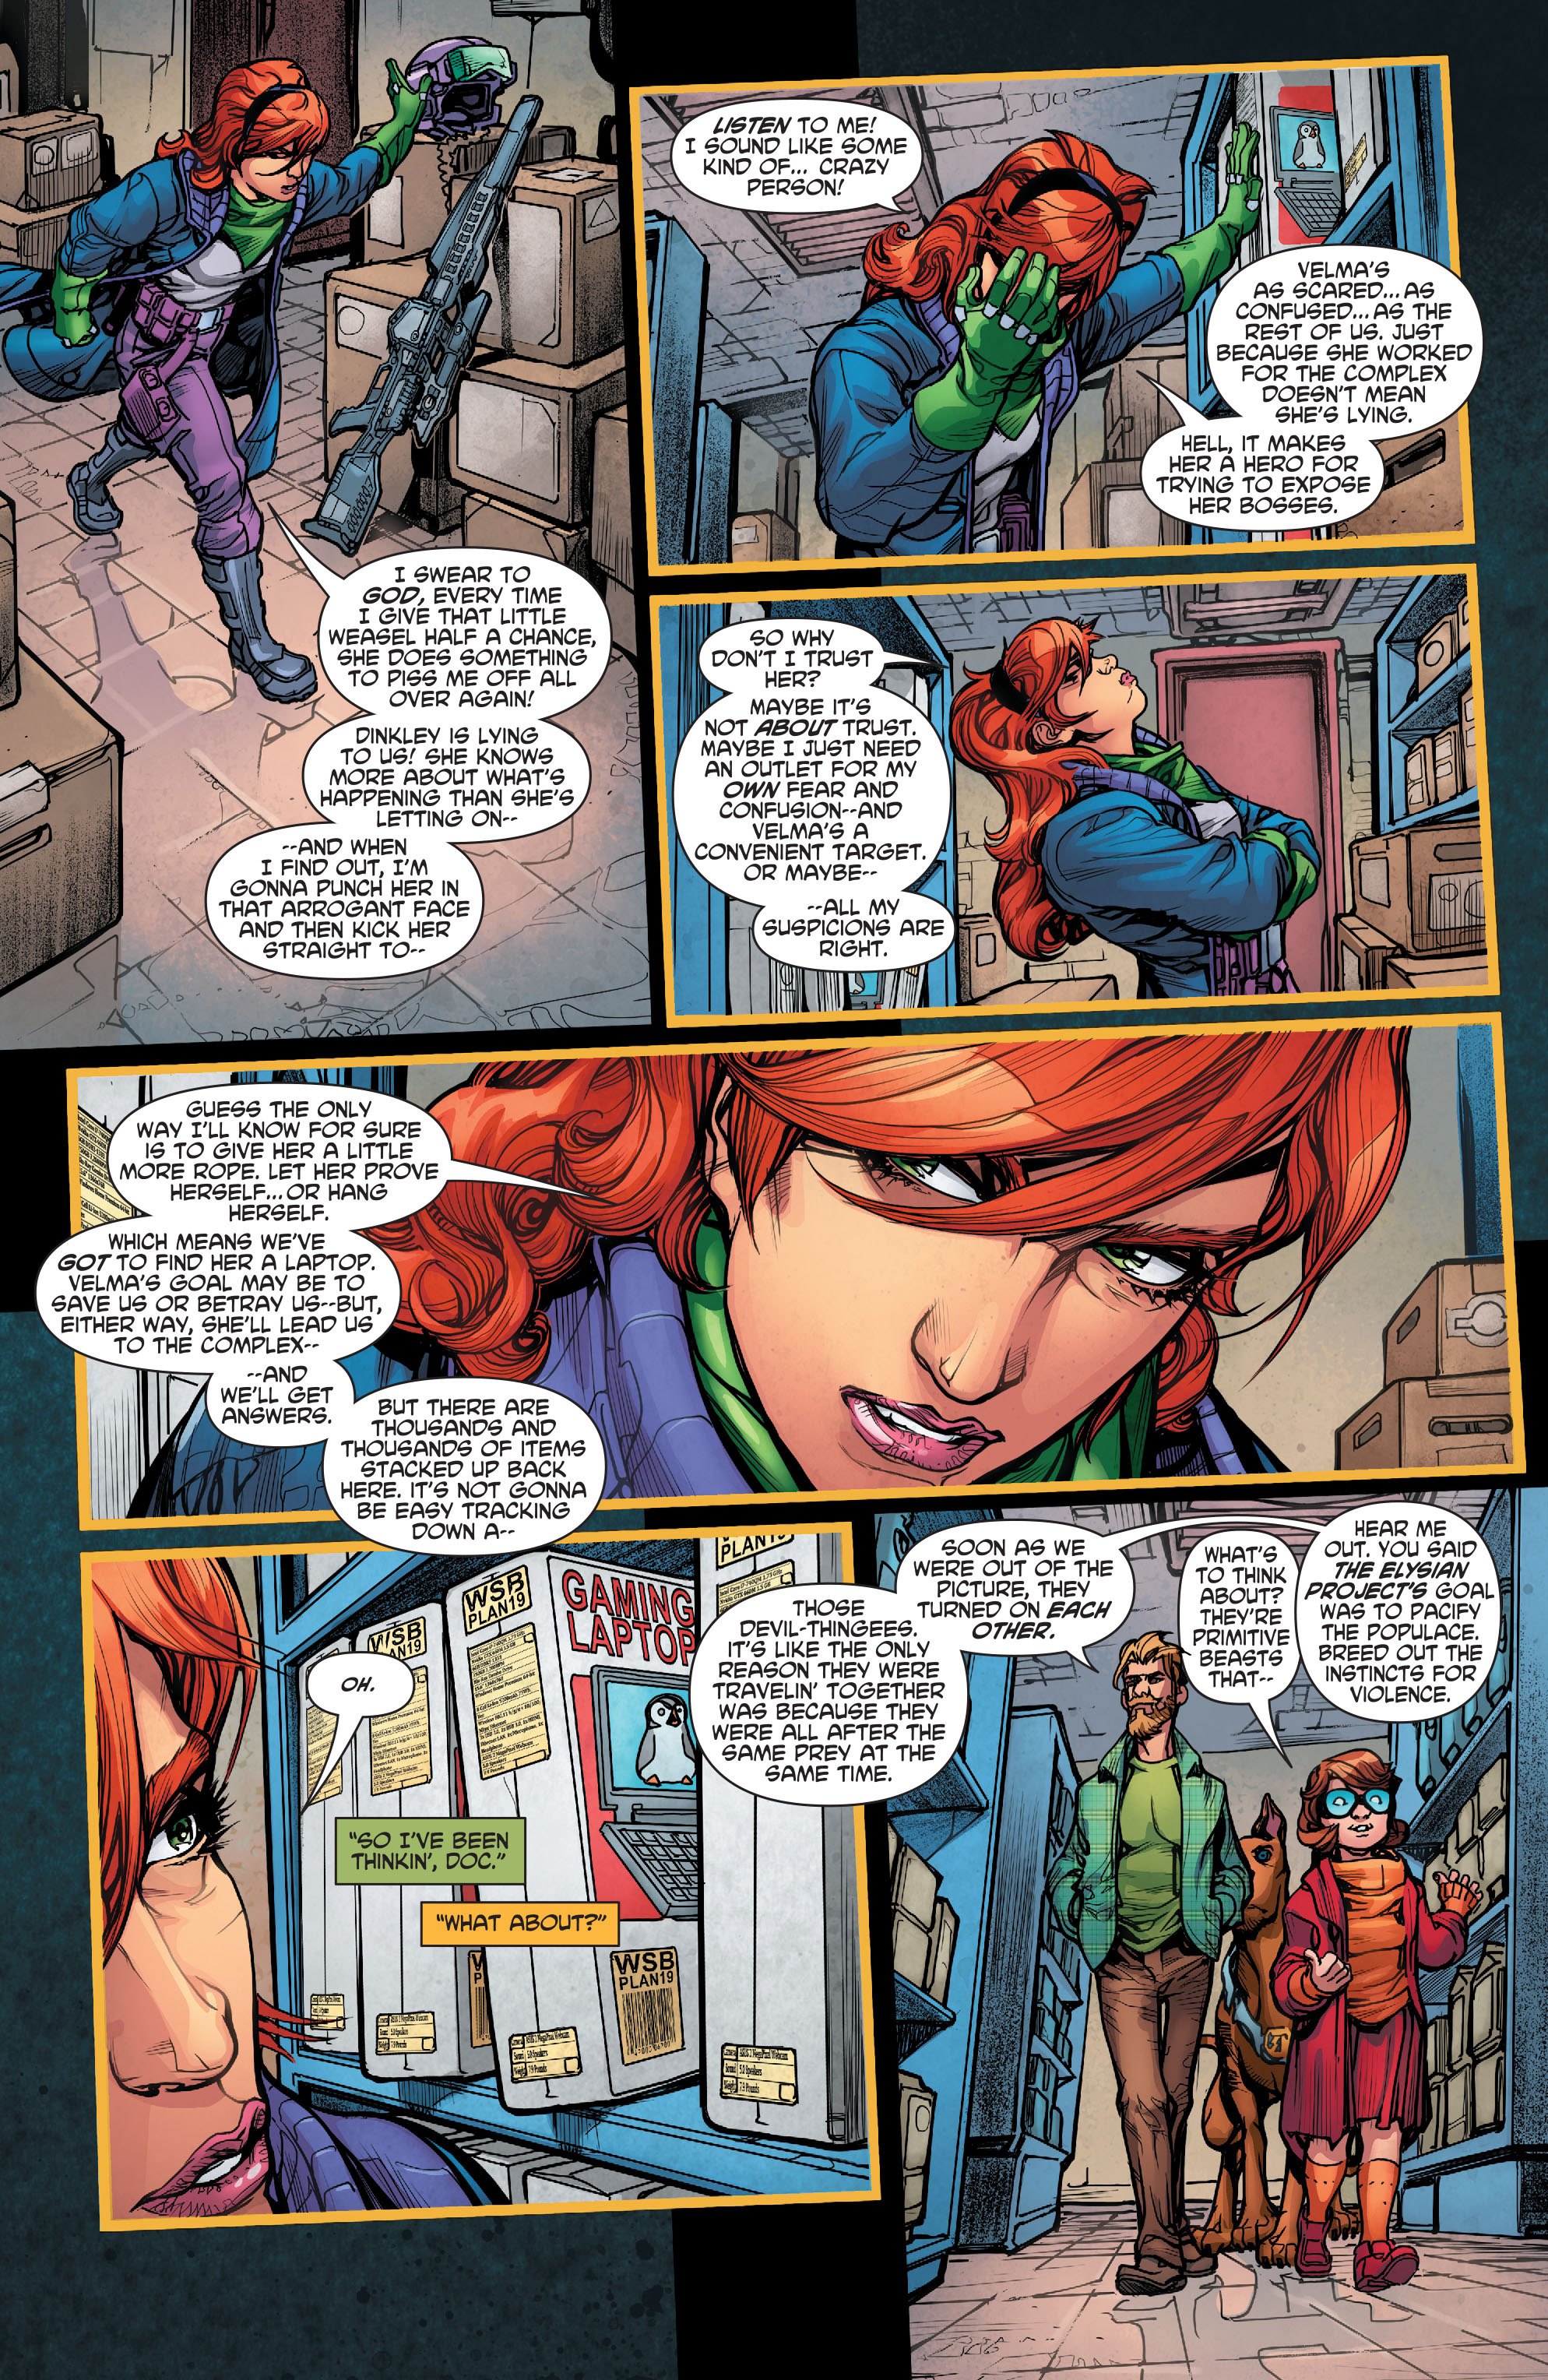 Read online Scooby Apocalypse comic -  Issue #5 - 24